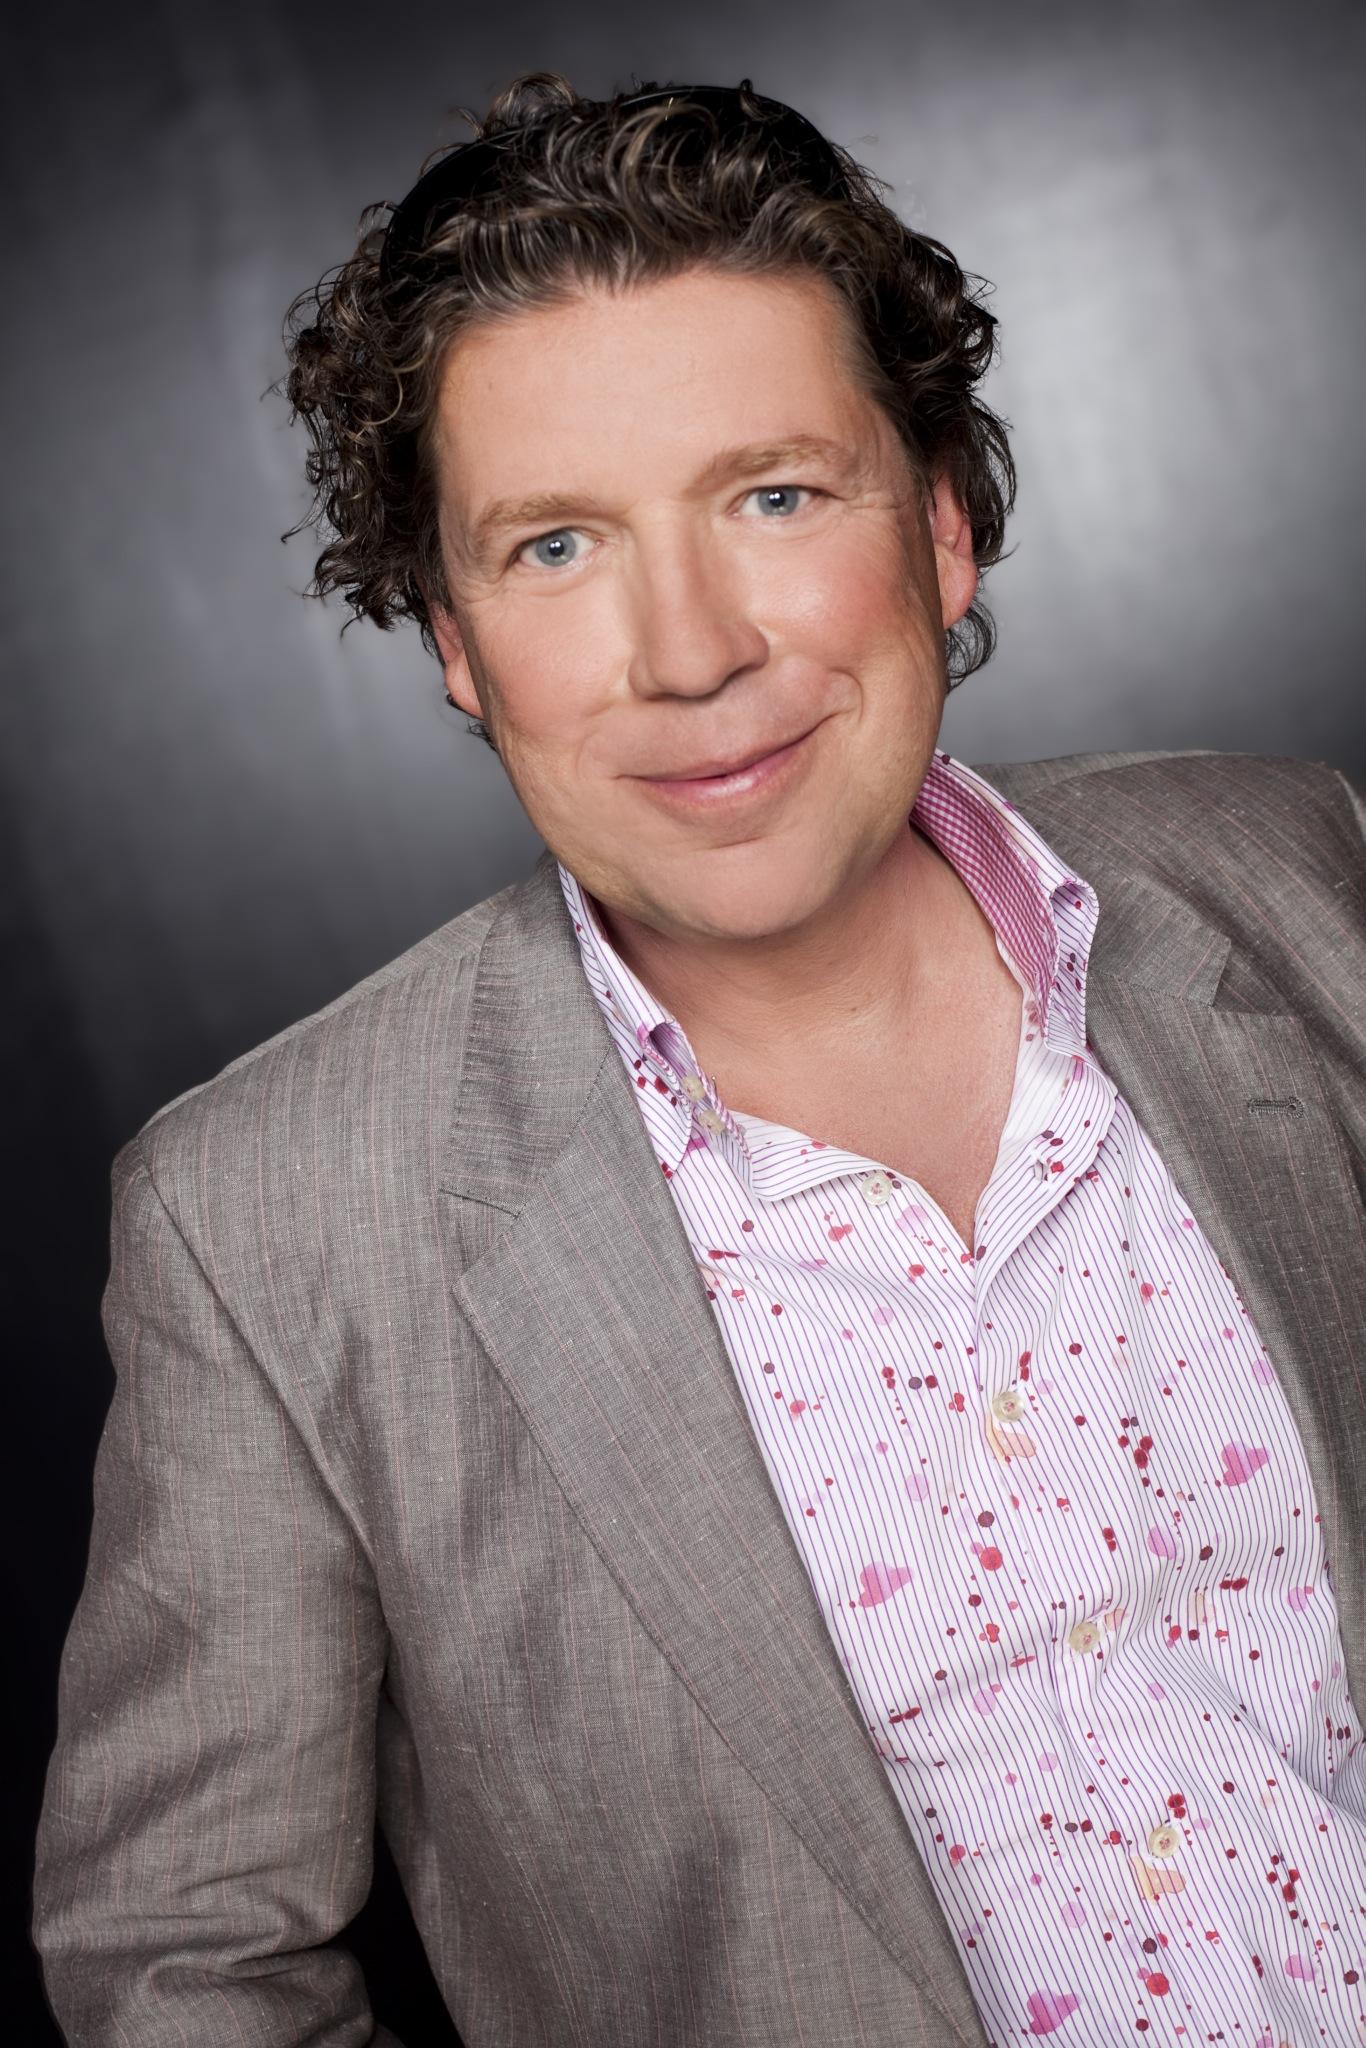 De 56-años, 180 cm de altura Henkjan Smits en 2018 foto